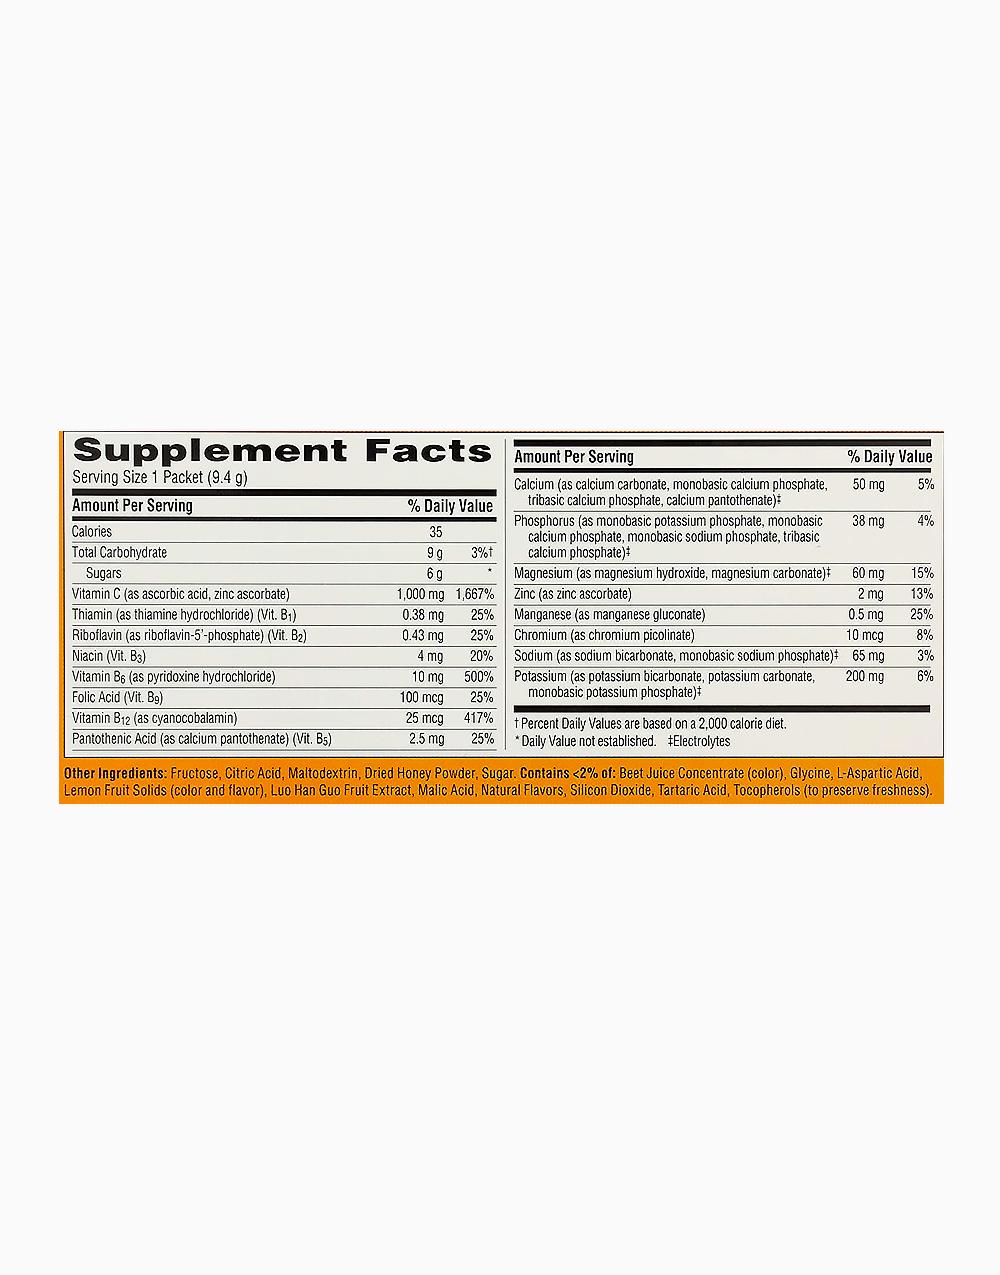 Pink Lemonade Flavor Dietary Supplement Fizzy Drink Mix with 1000mg Vitamin C (1 Sachet) by Emergen-C